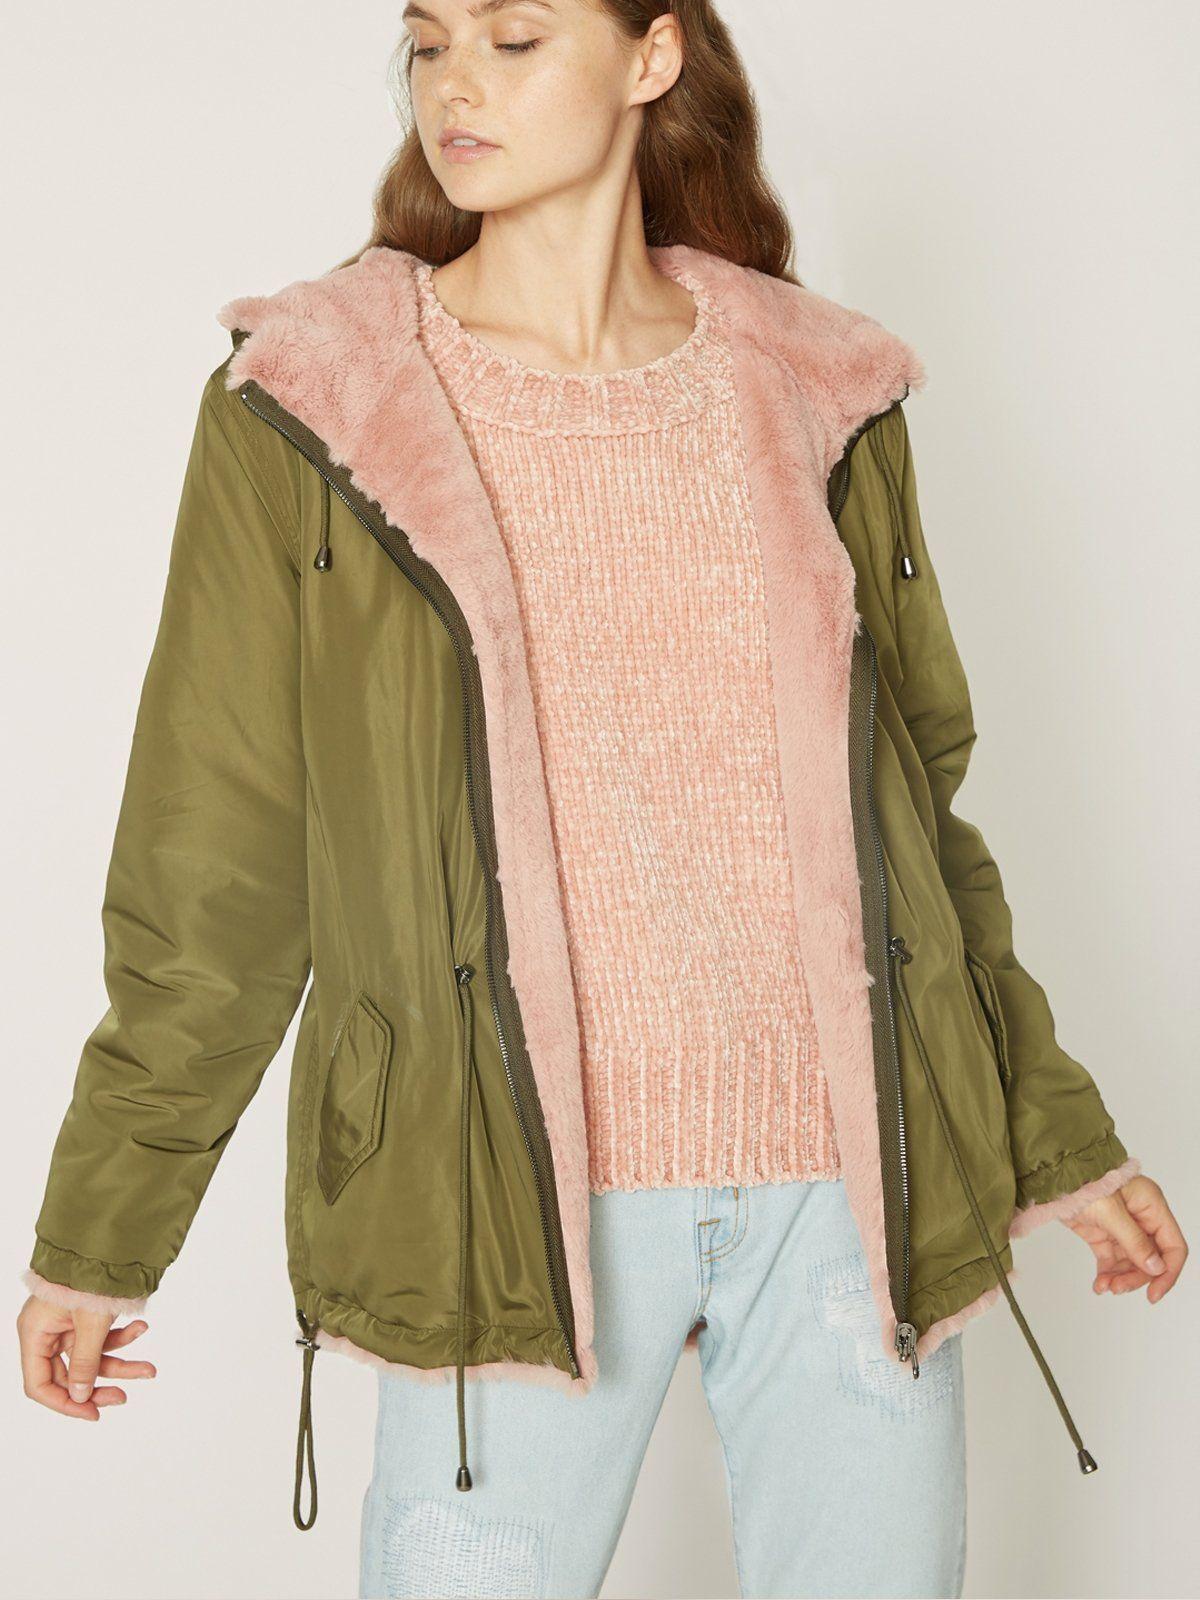 Reversible Fur Snug Mini Parka Jacket Prosperity Green By Sanctuary Clothing Sanctuary Clothing Womens Fashion Jackets Junior Coats [ 1600 x 1200 Pixel ]